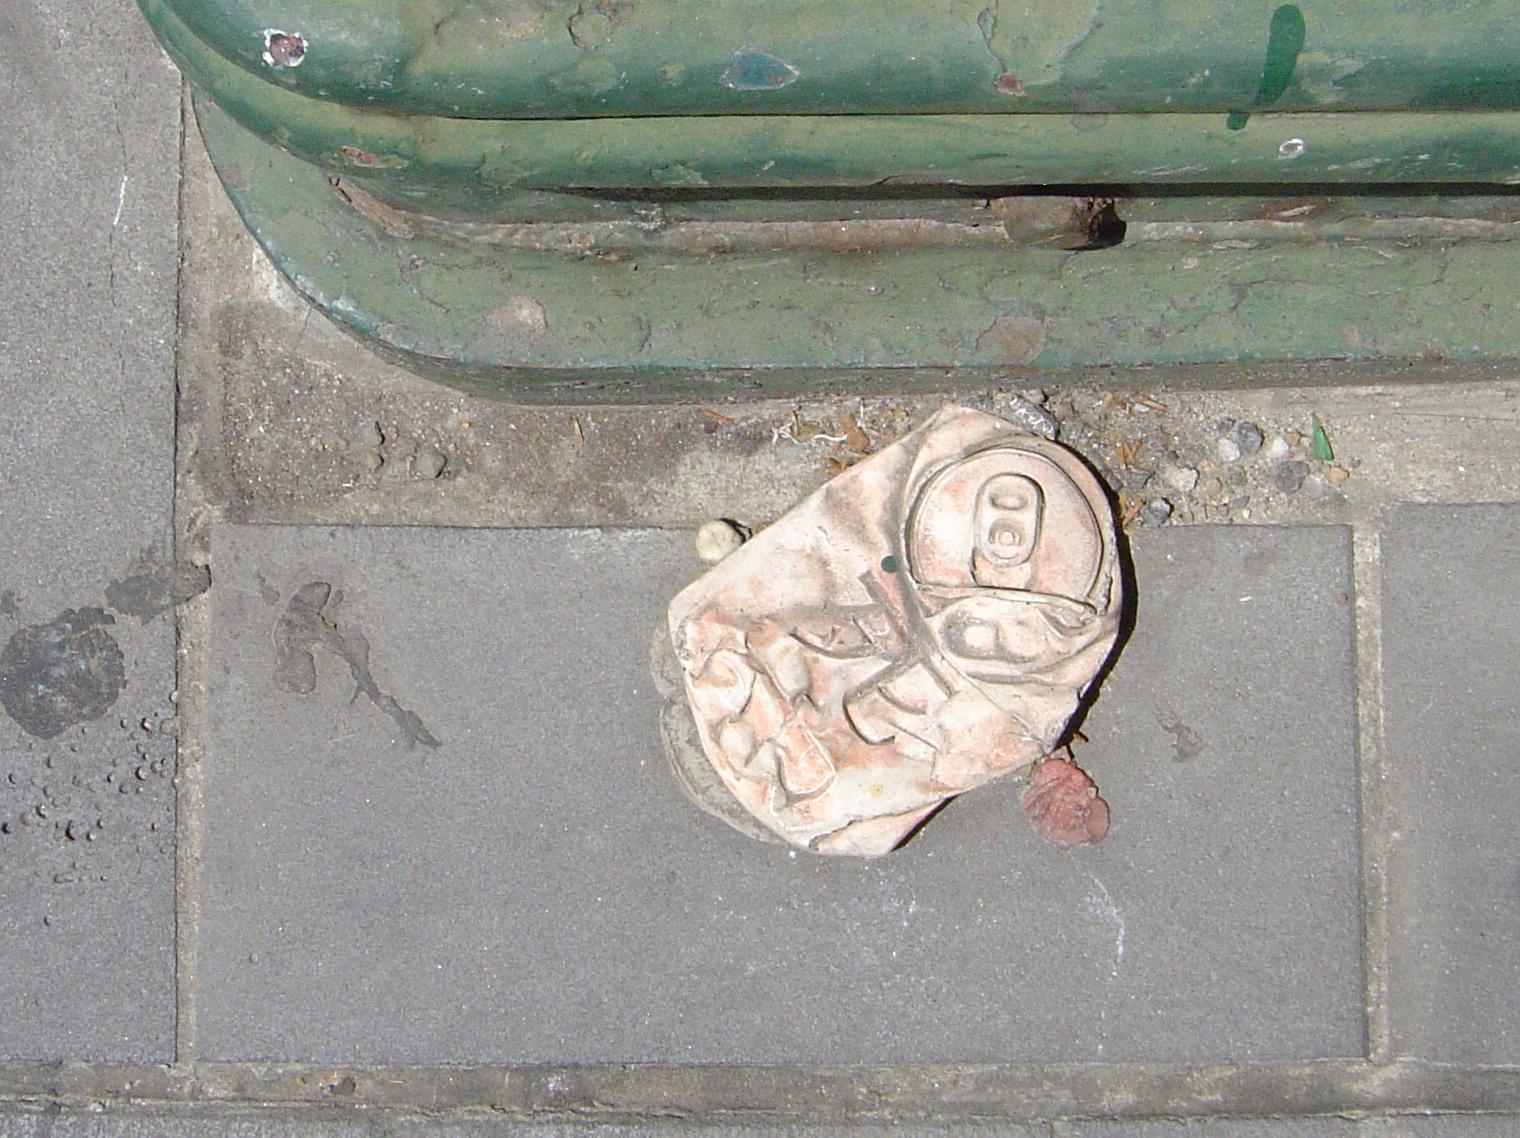 Street art sculpture iii black mark